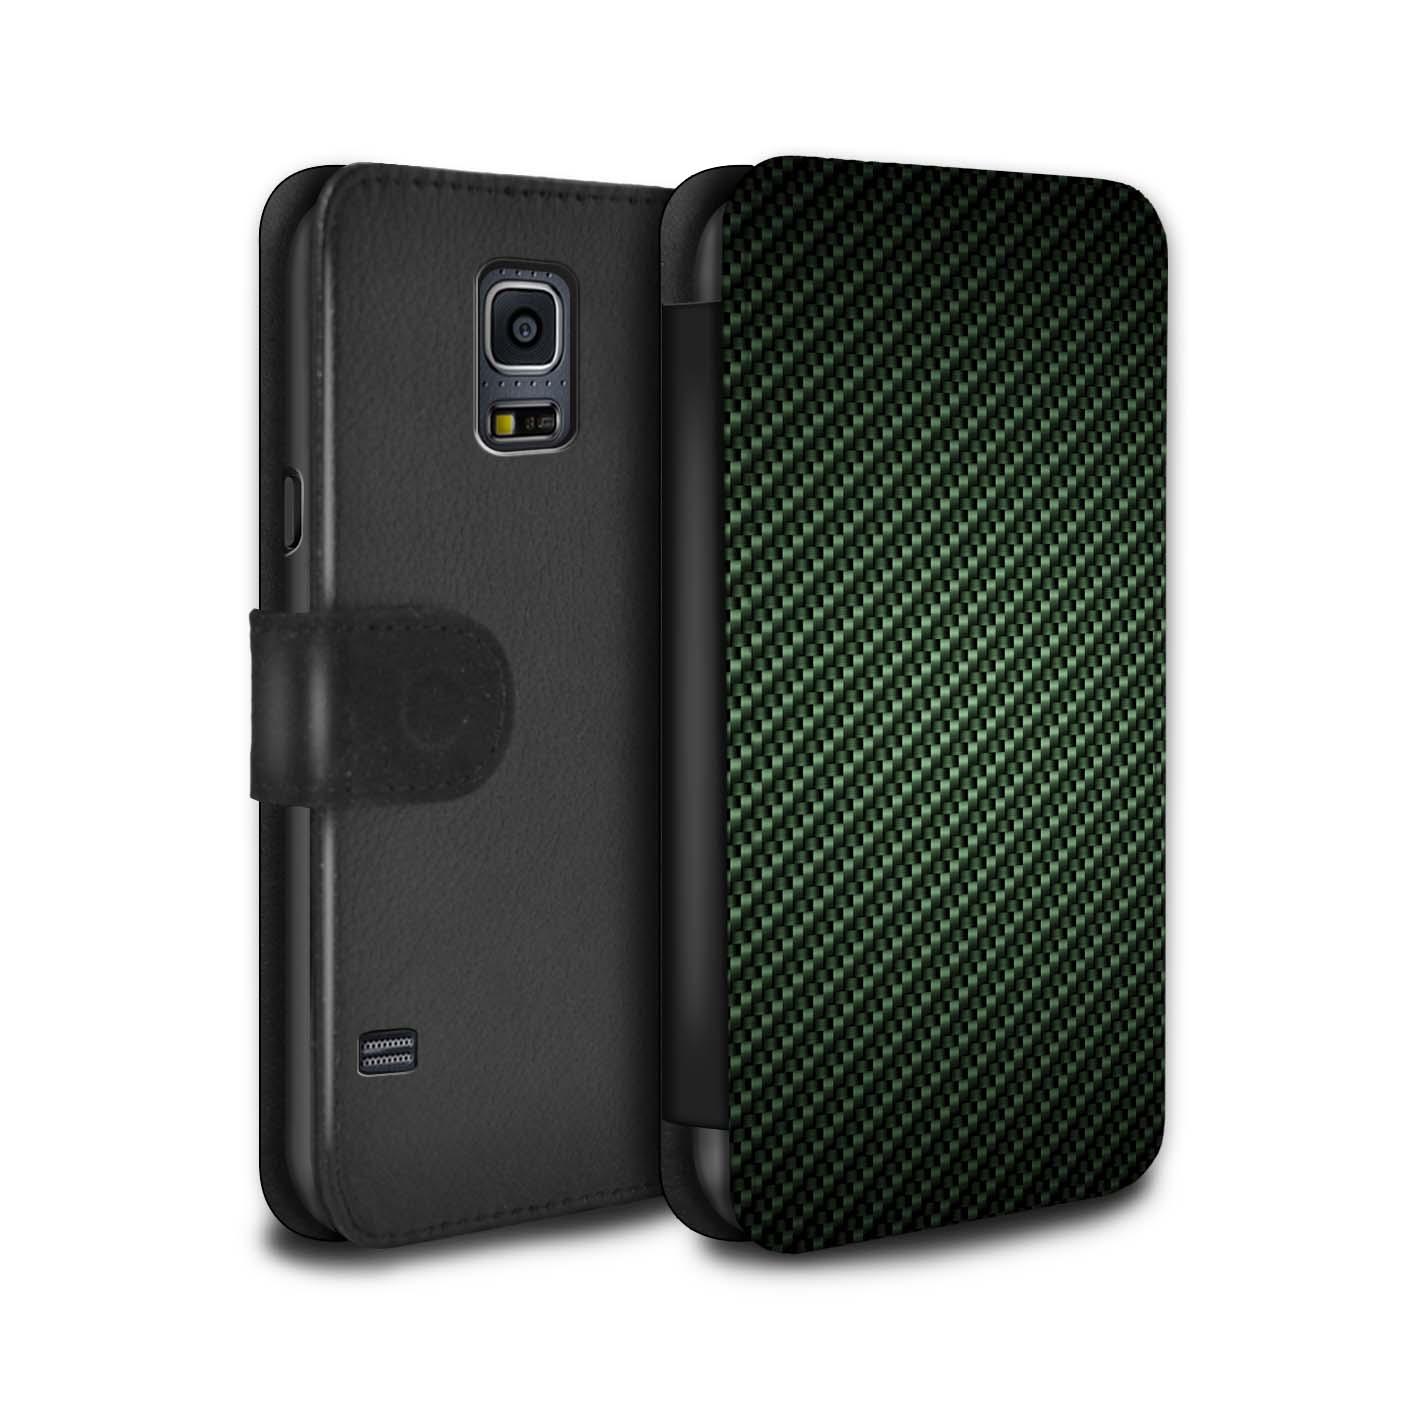 STUFF4-Coque-Case-Cuir-PU-pour-Samsung-Galaxy-S5-SV-Motif-de-Fibre-de-Carbone